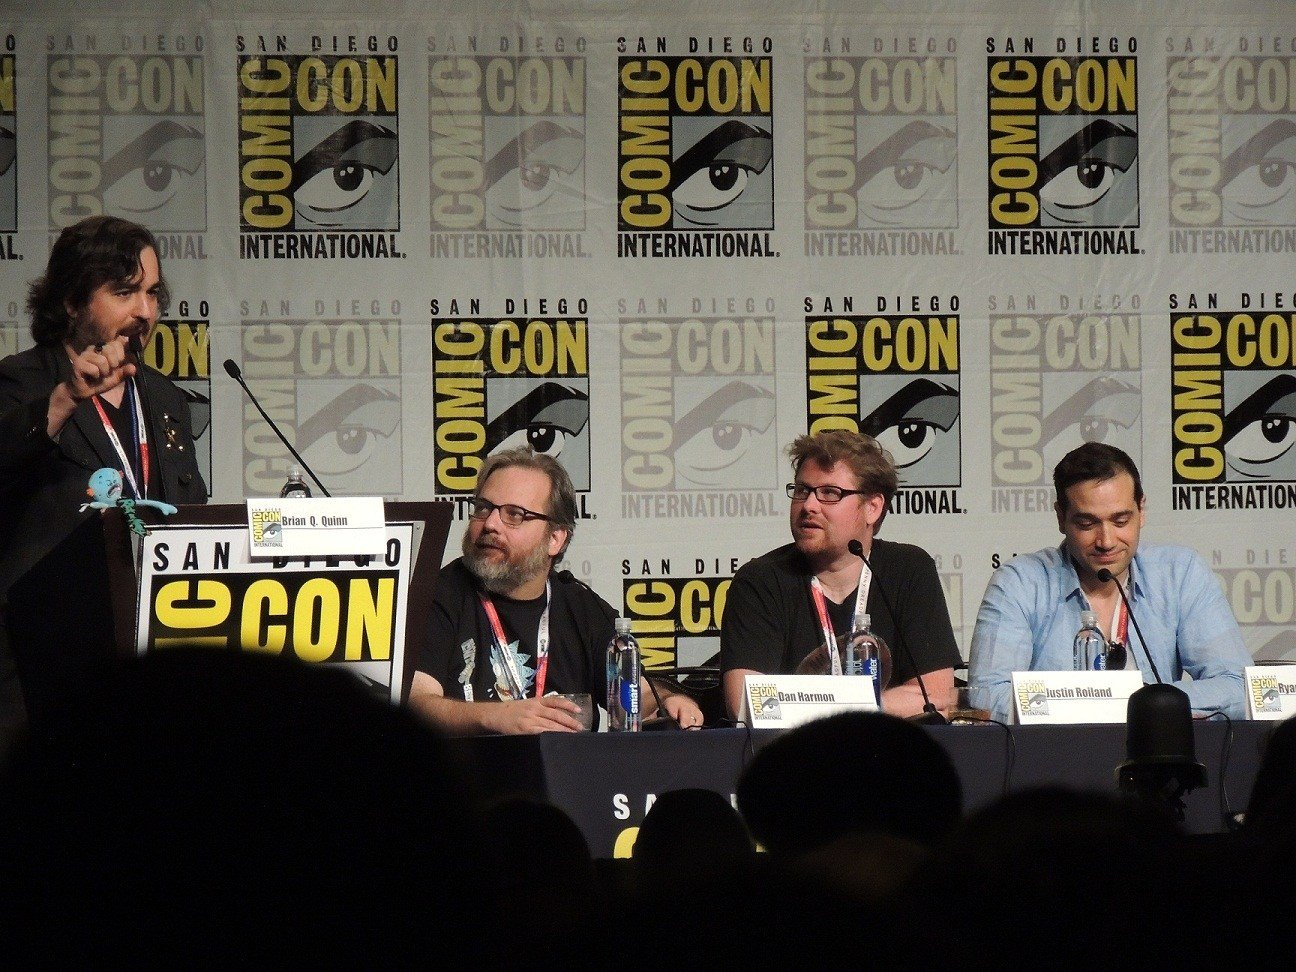 Rick and Morty Panel (LtoR) Brian Quinn, Dan Harmon, Justin Roiland, Ryan Ridley